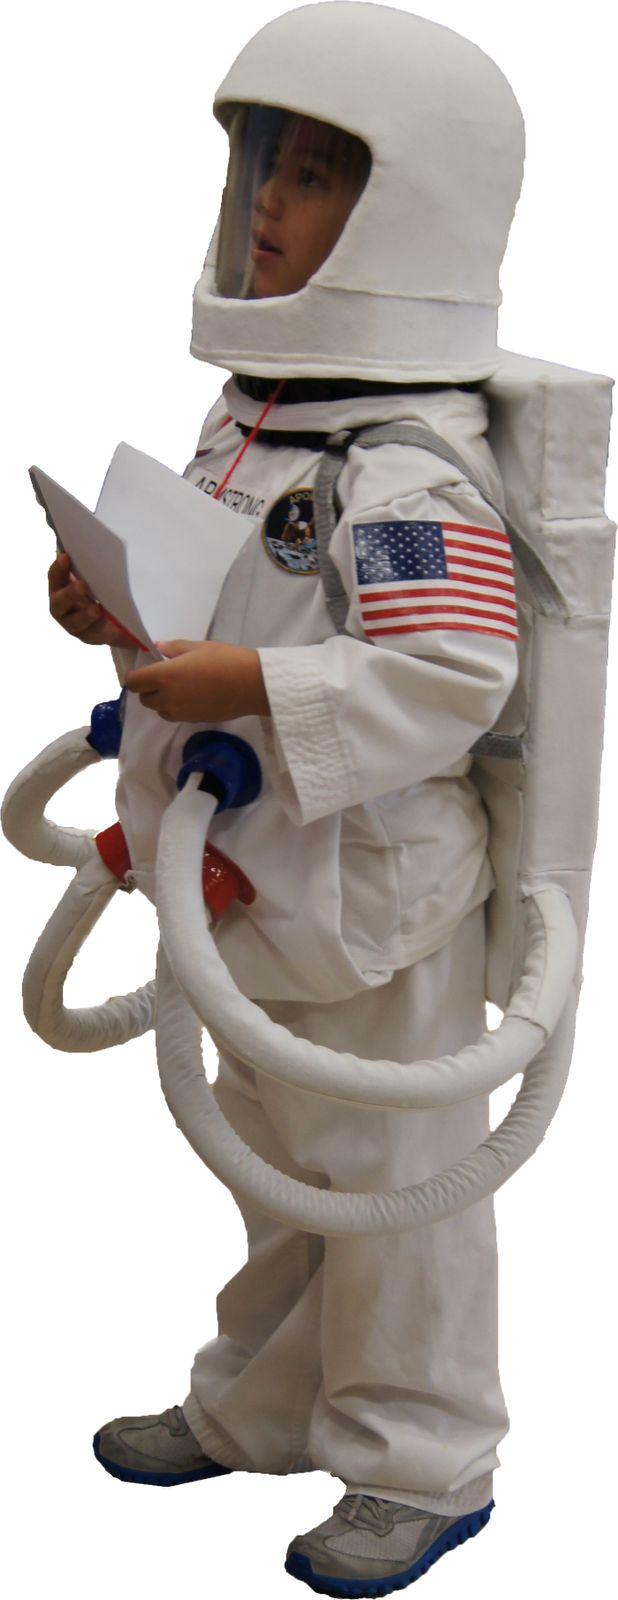 astronaut neil armstrong on uniform - photo #24